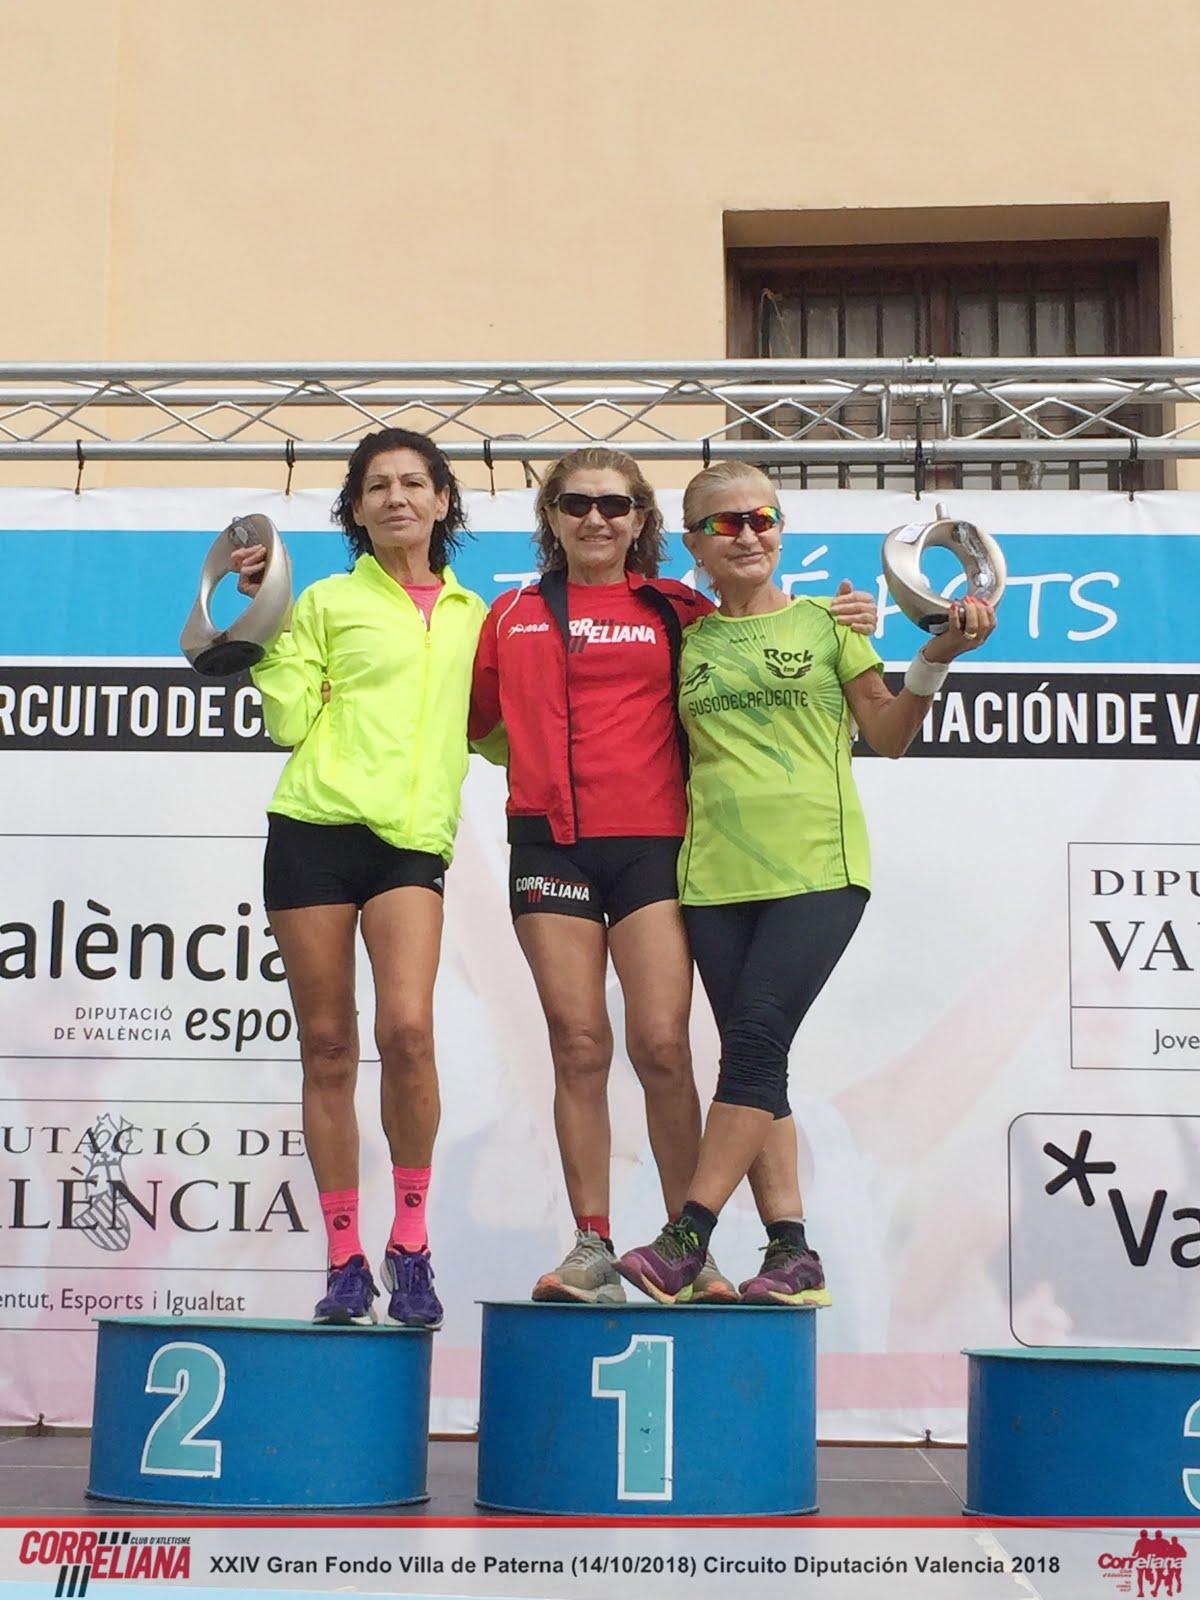 "MAGDA VILA GARCIA, 1ª VETERANA C ""XXIV GRAN FONS VILA DE PATERNA 2018-CIRCUITO DIPUTACIÓN VALENCIA"